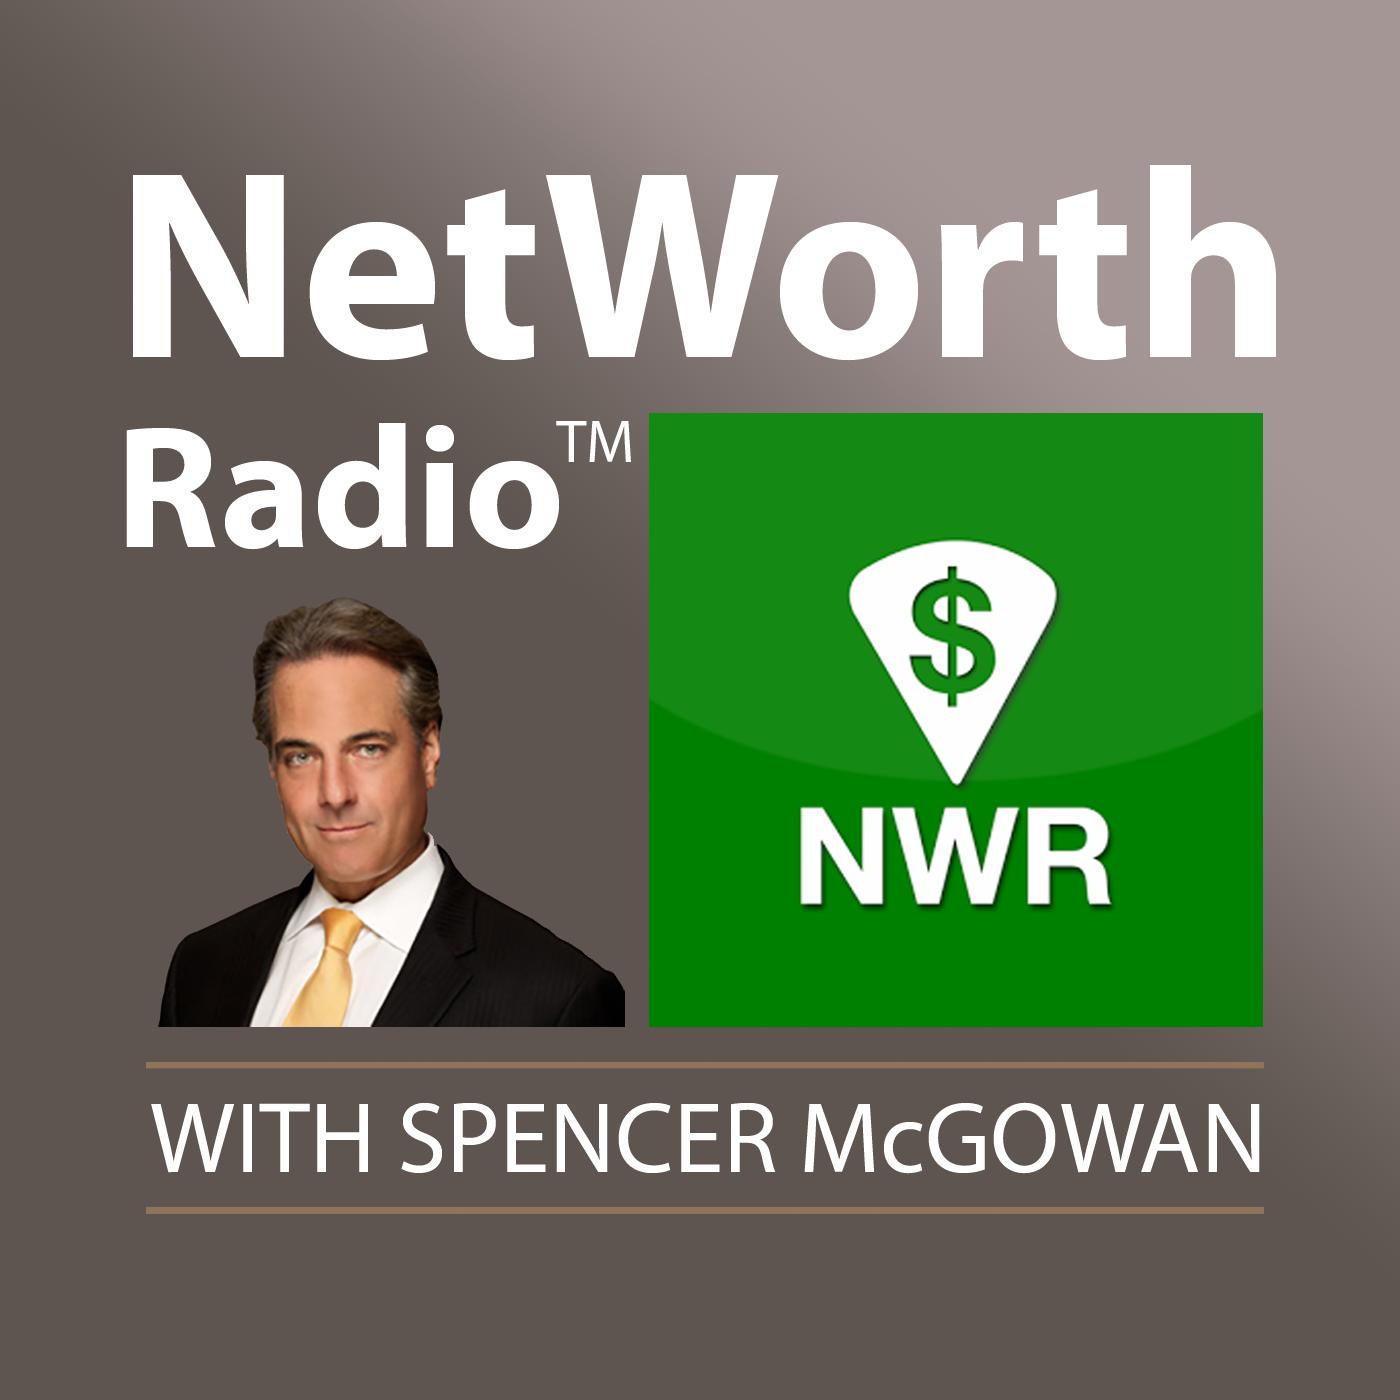 NetWorth Radio